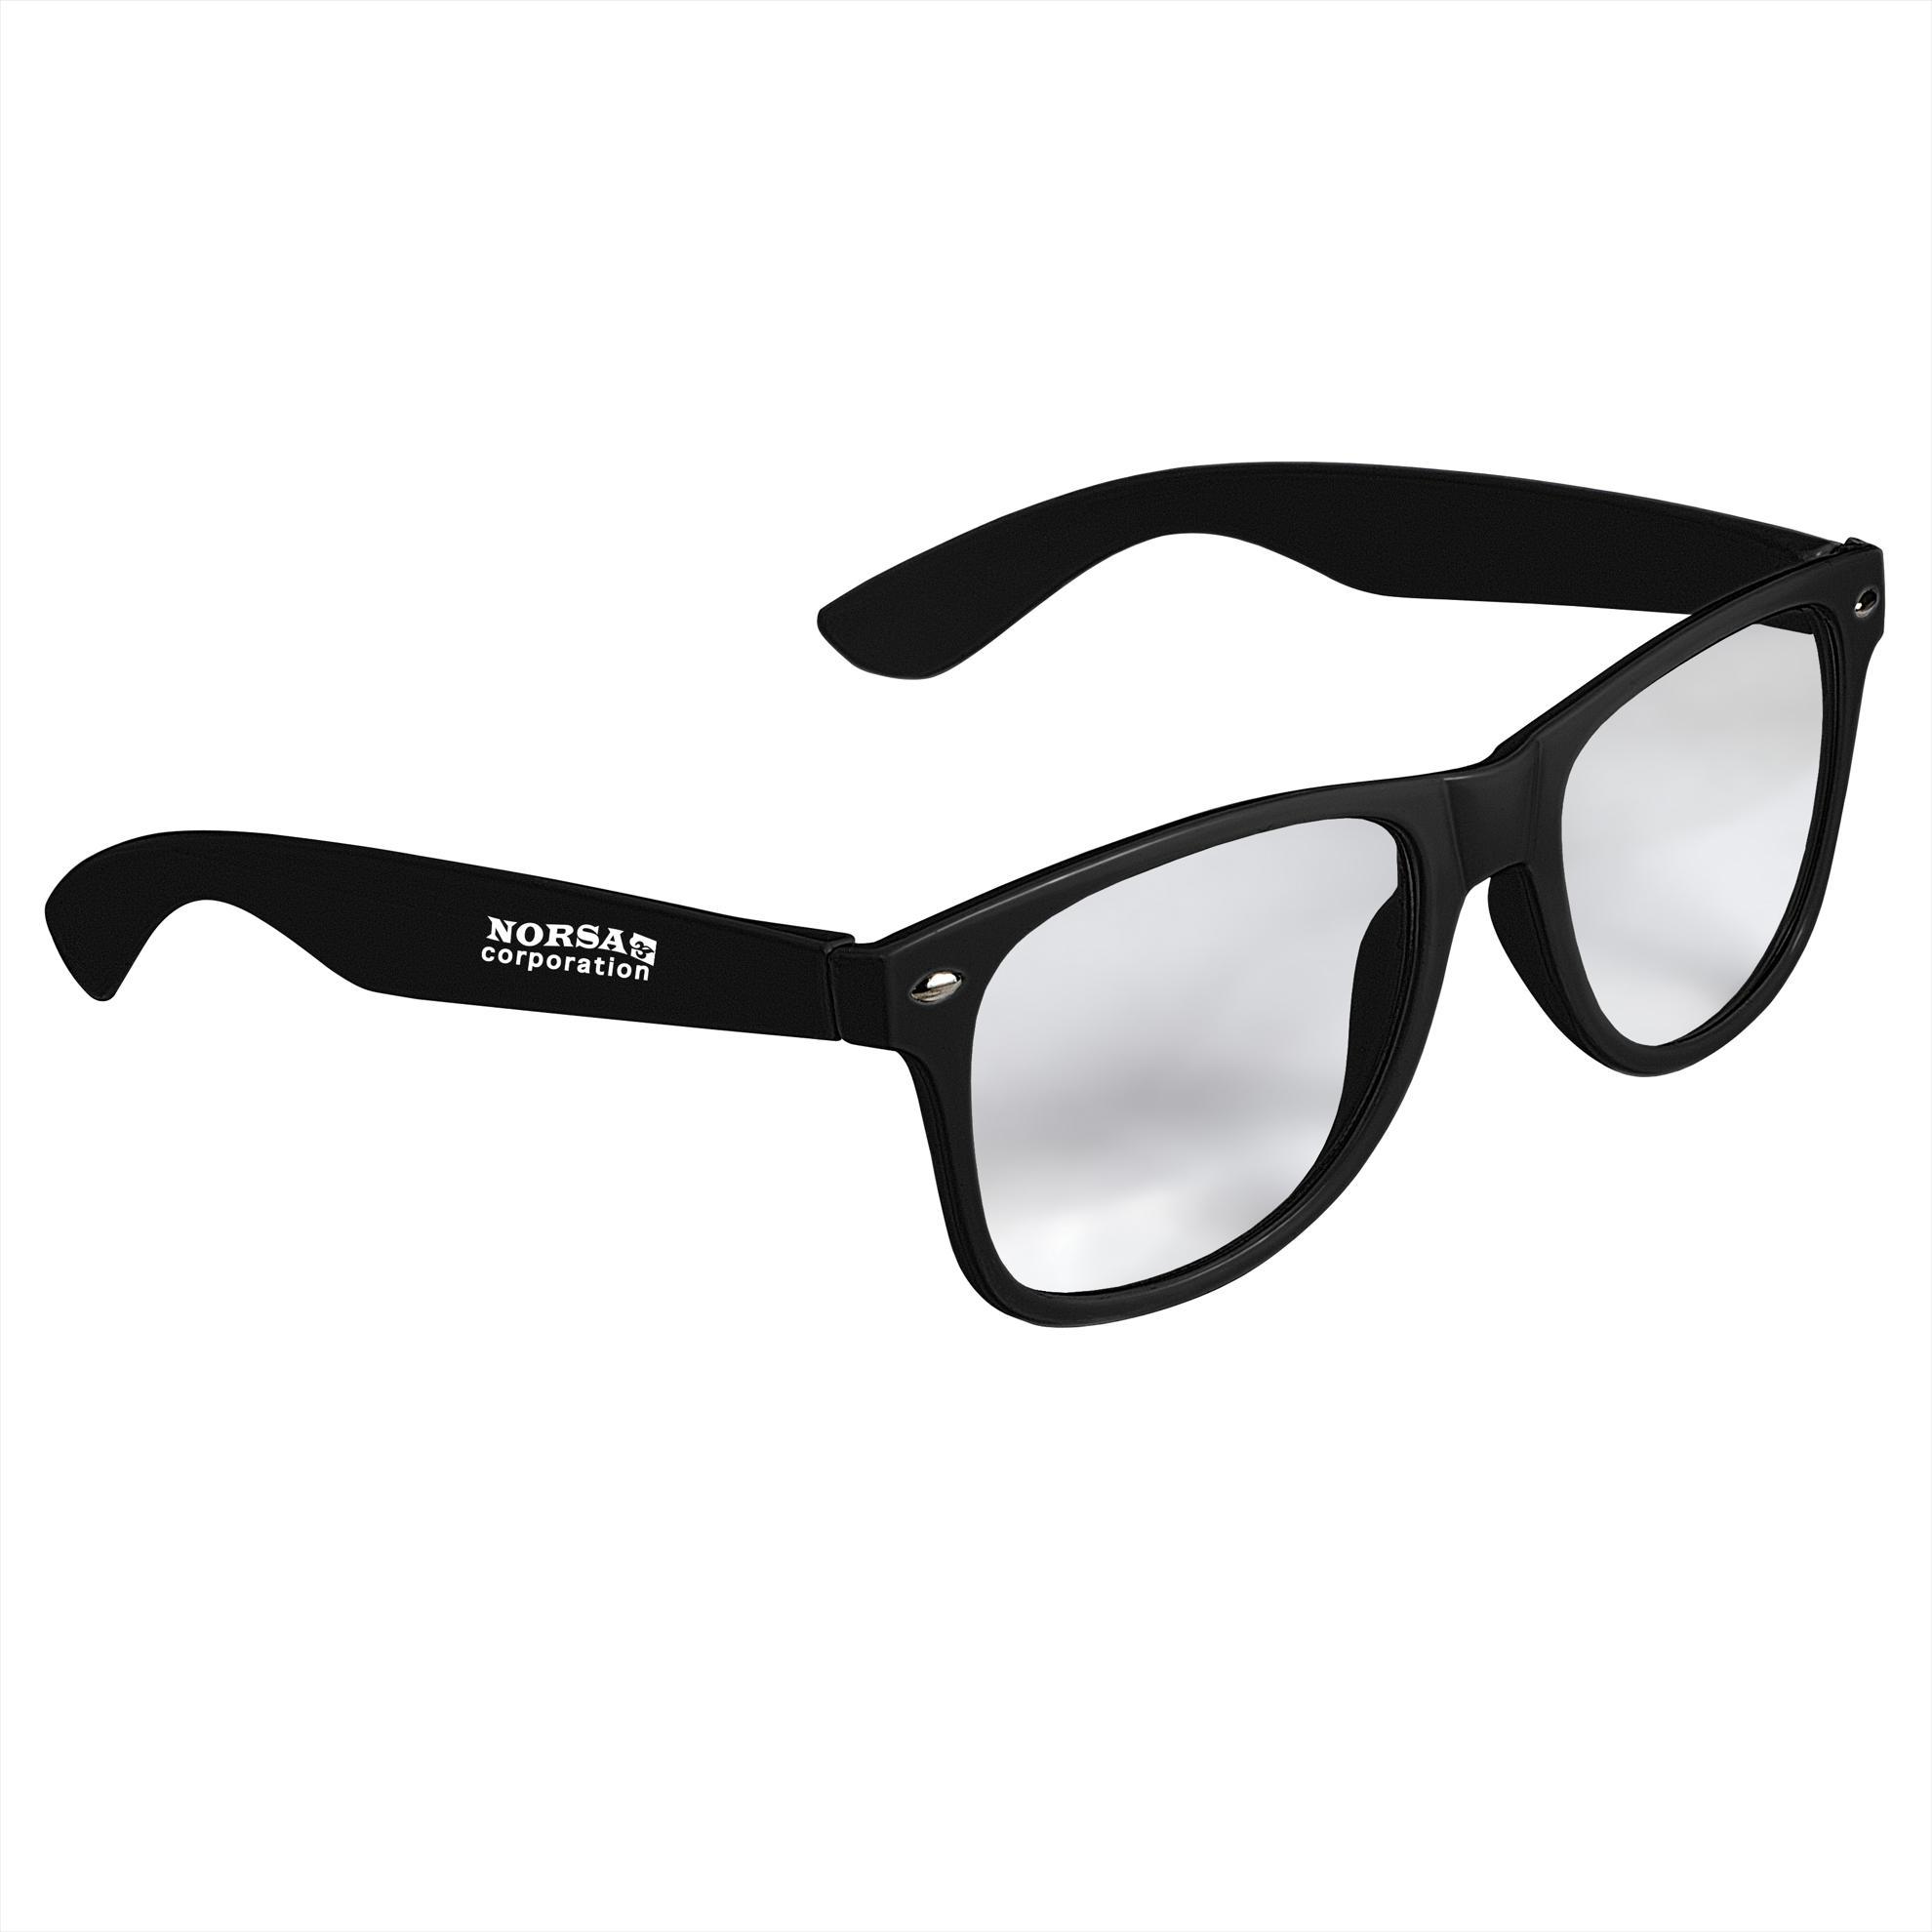 GoodValue Cool Vibes Clear Lens Sunglasses, #26048, 1 Colour Imprint